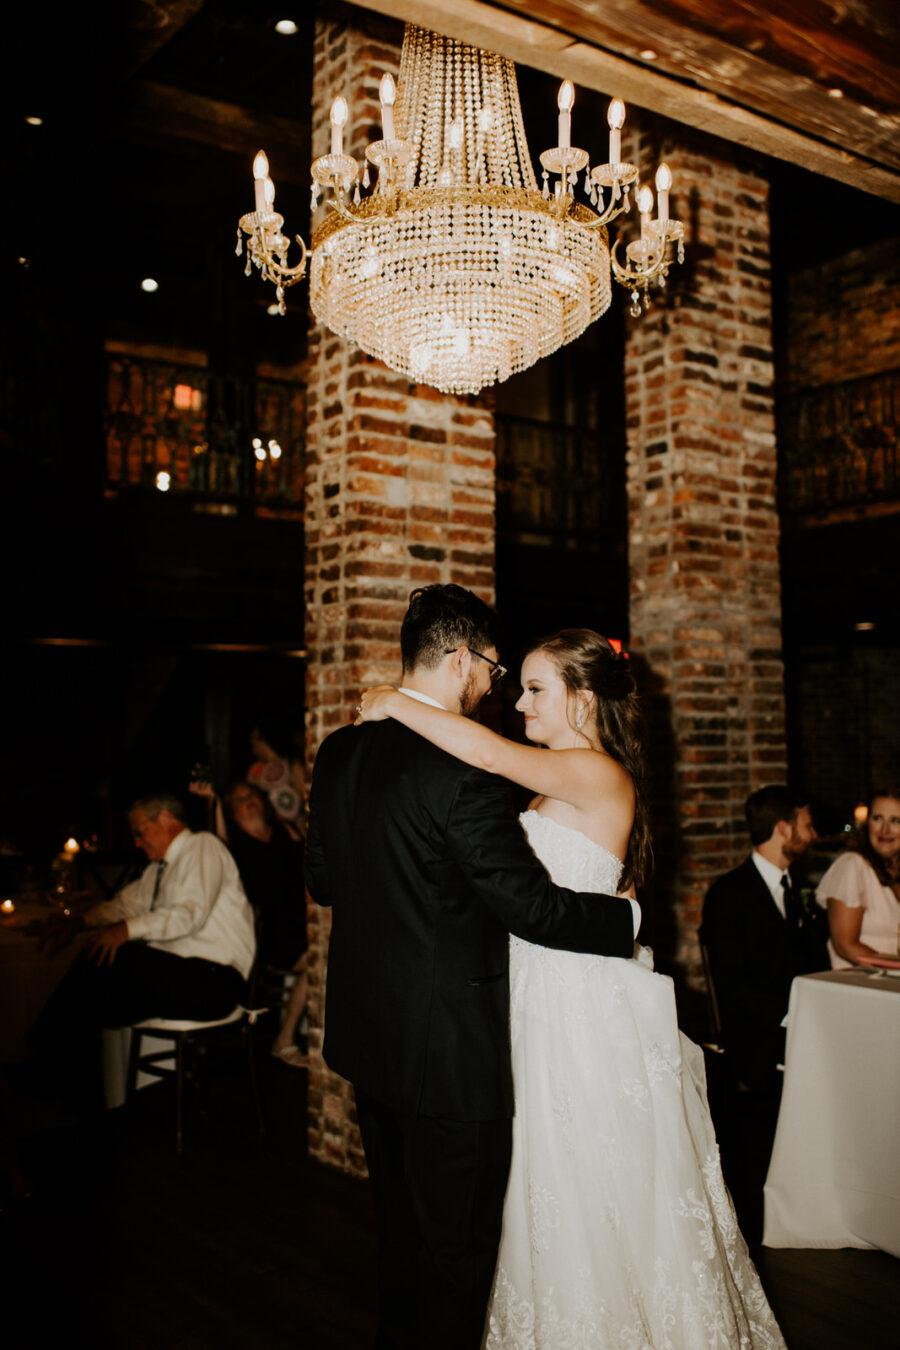 Wedding first dance: Romantic Nashville Wedding at The Bedford featured on Nashville Bride Guide